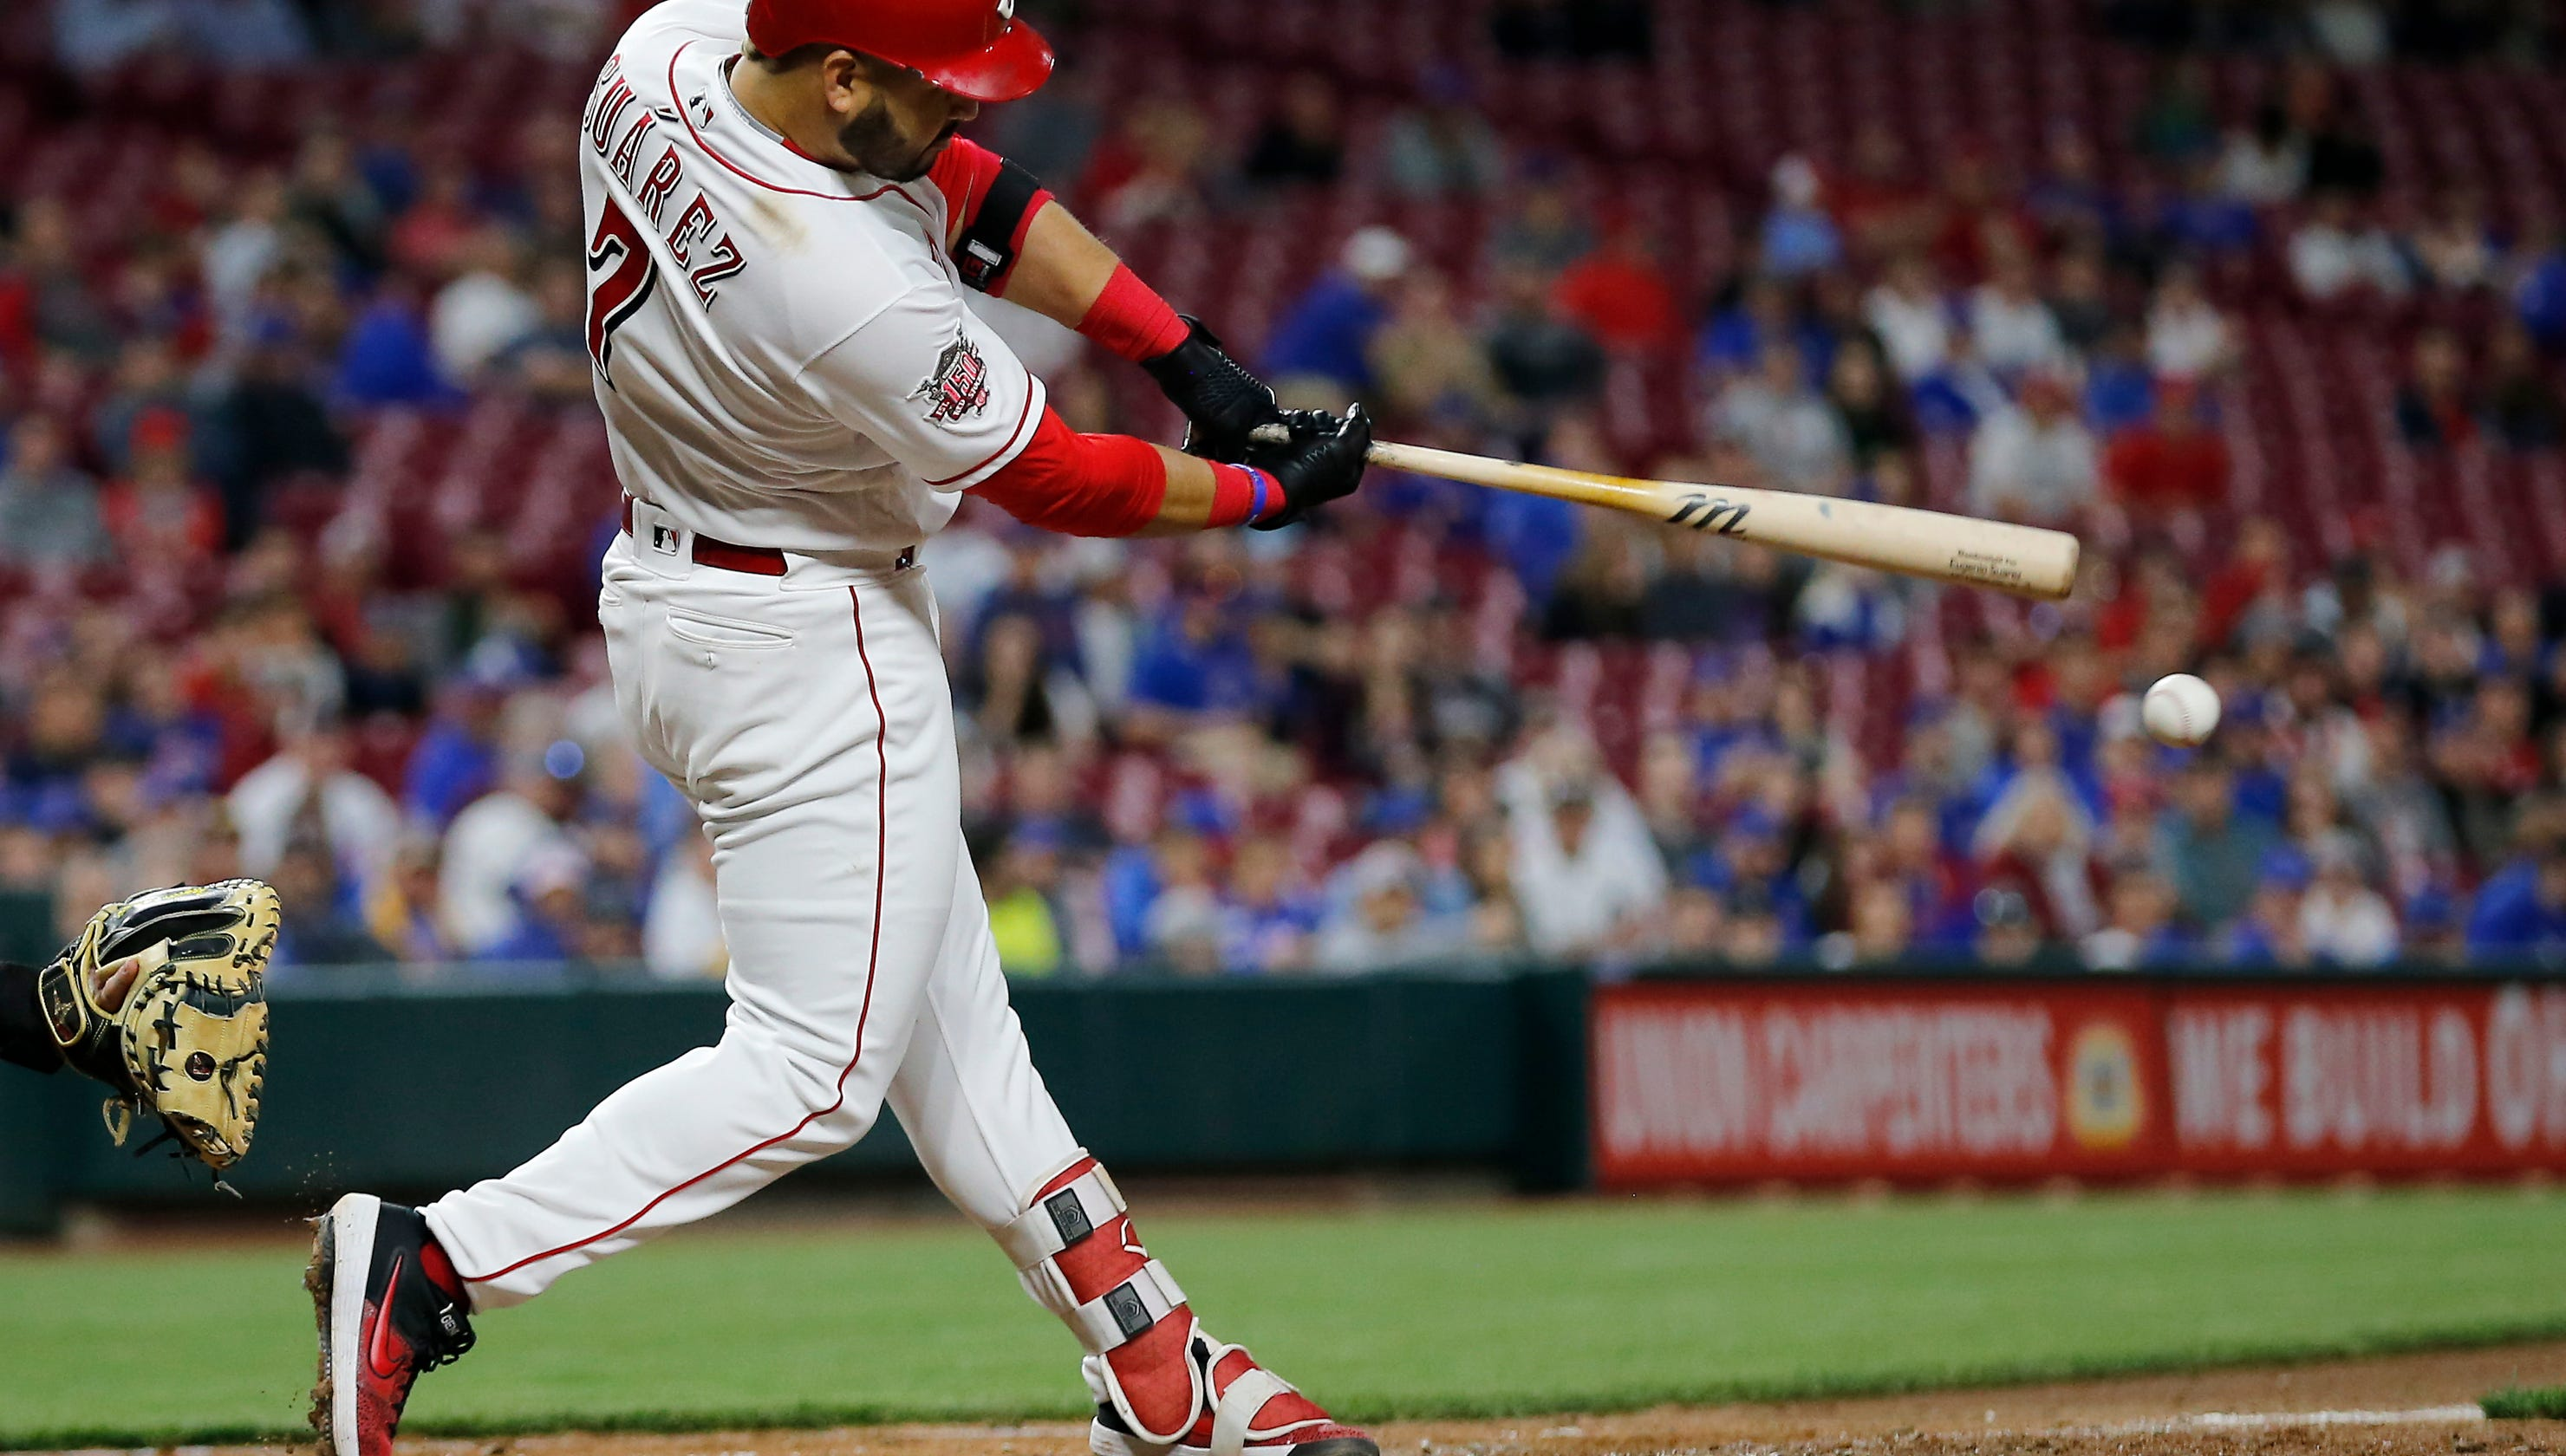 095fe4851 Cincinnati Reds third baseman Eugenio Suárez ignites the middle of the  lineup